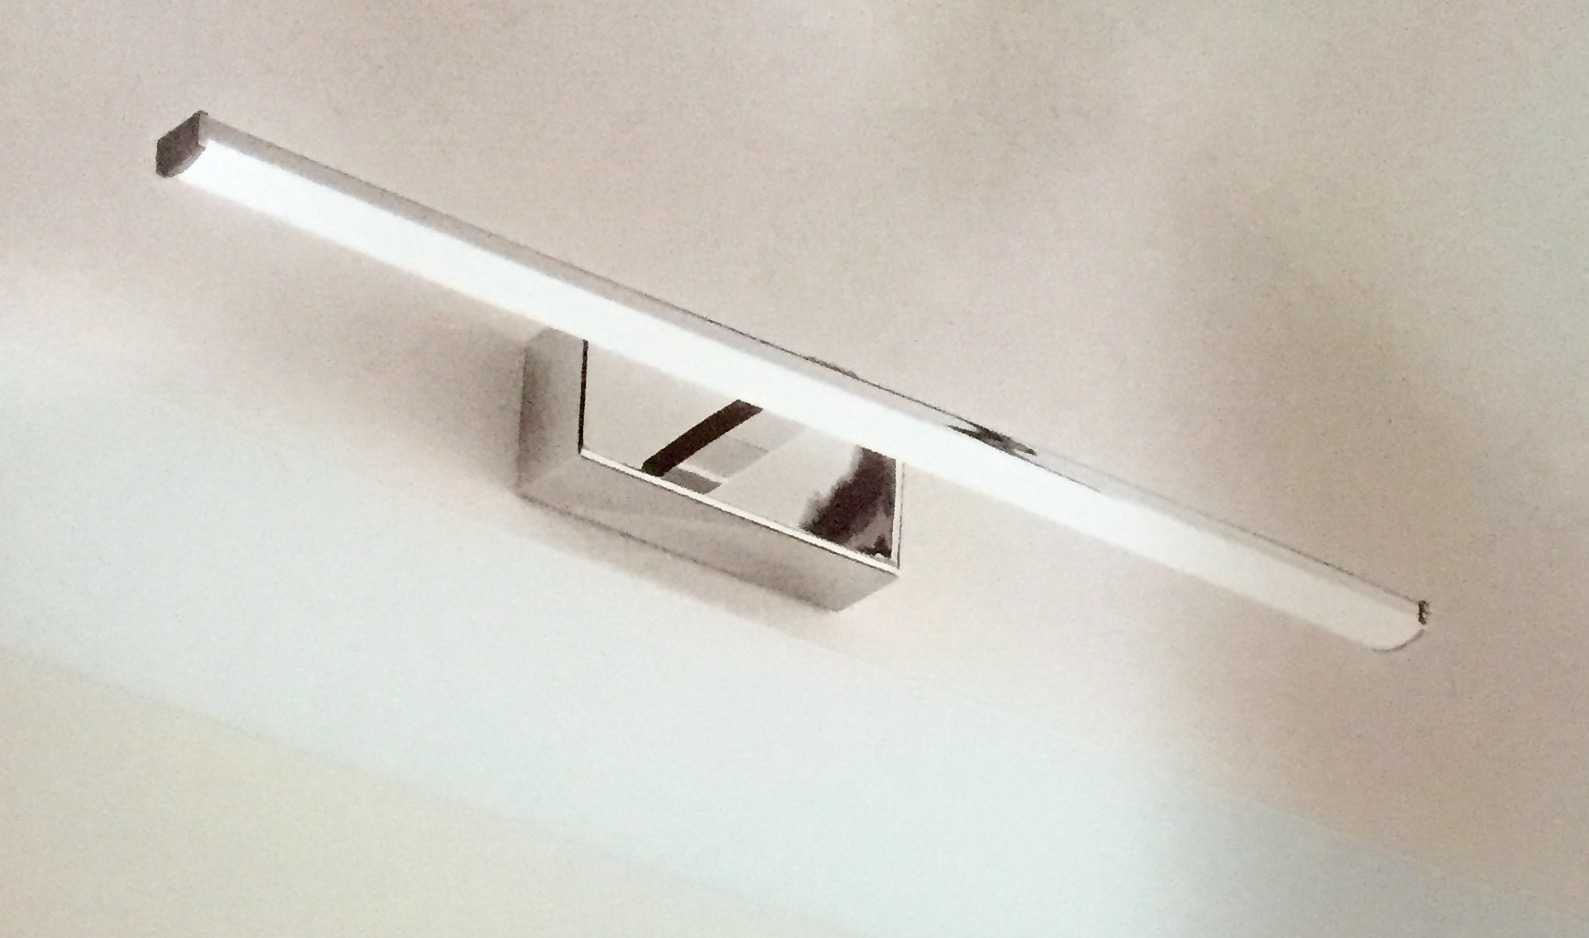 Illuminazione fabas luce nala 3361 21 138 metallo lampade - Lampade ikea da parete ...